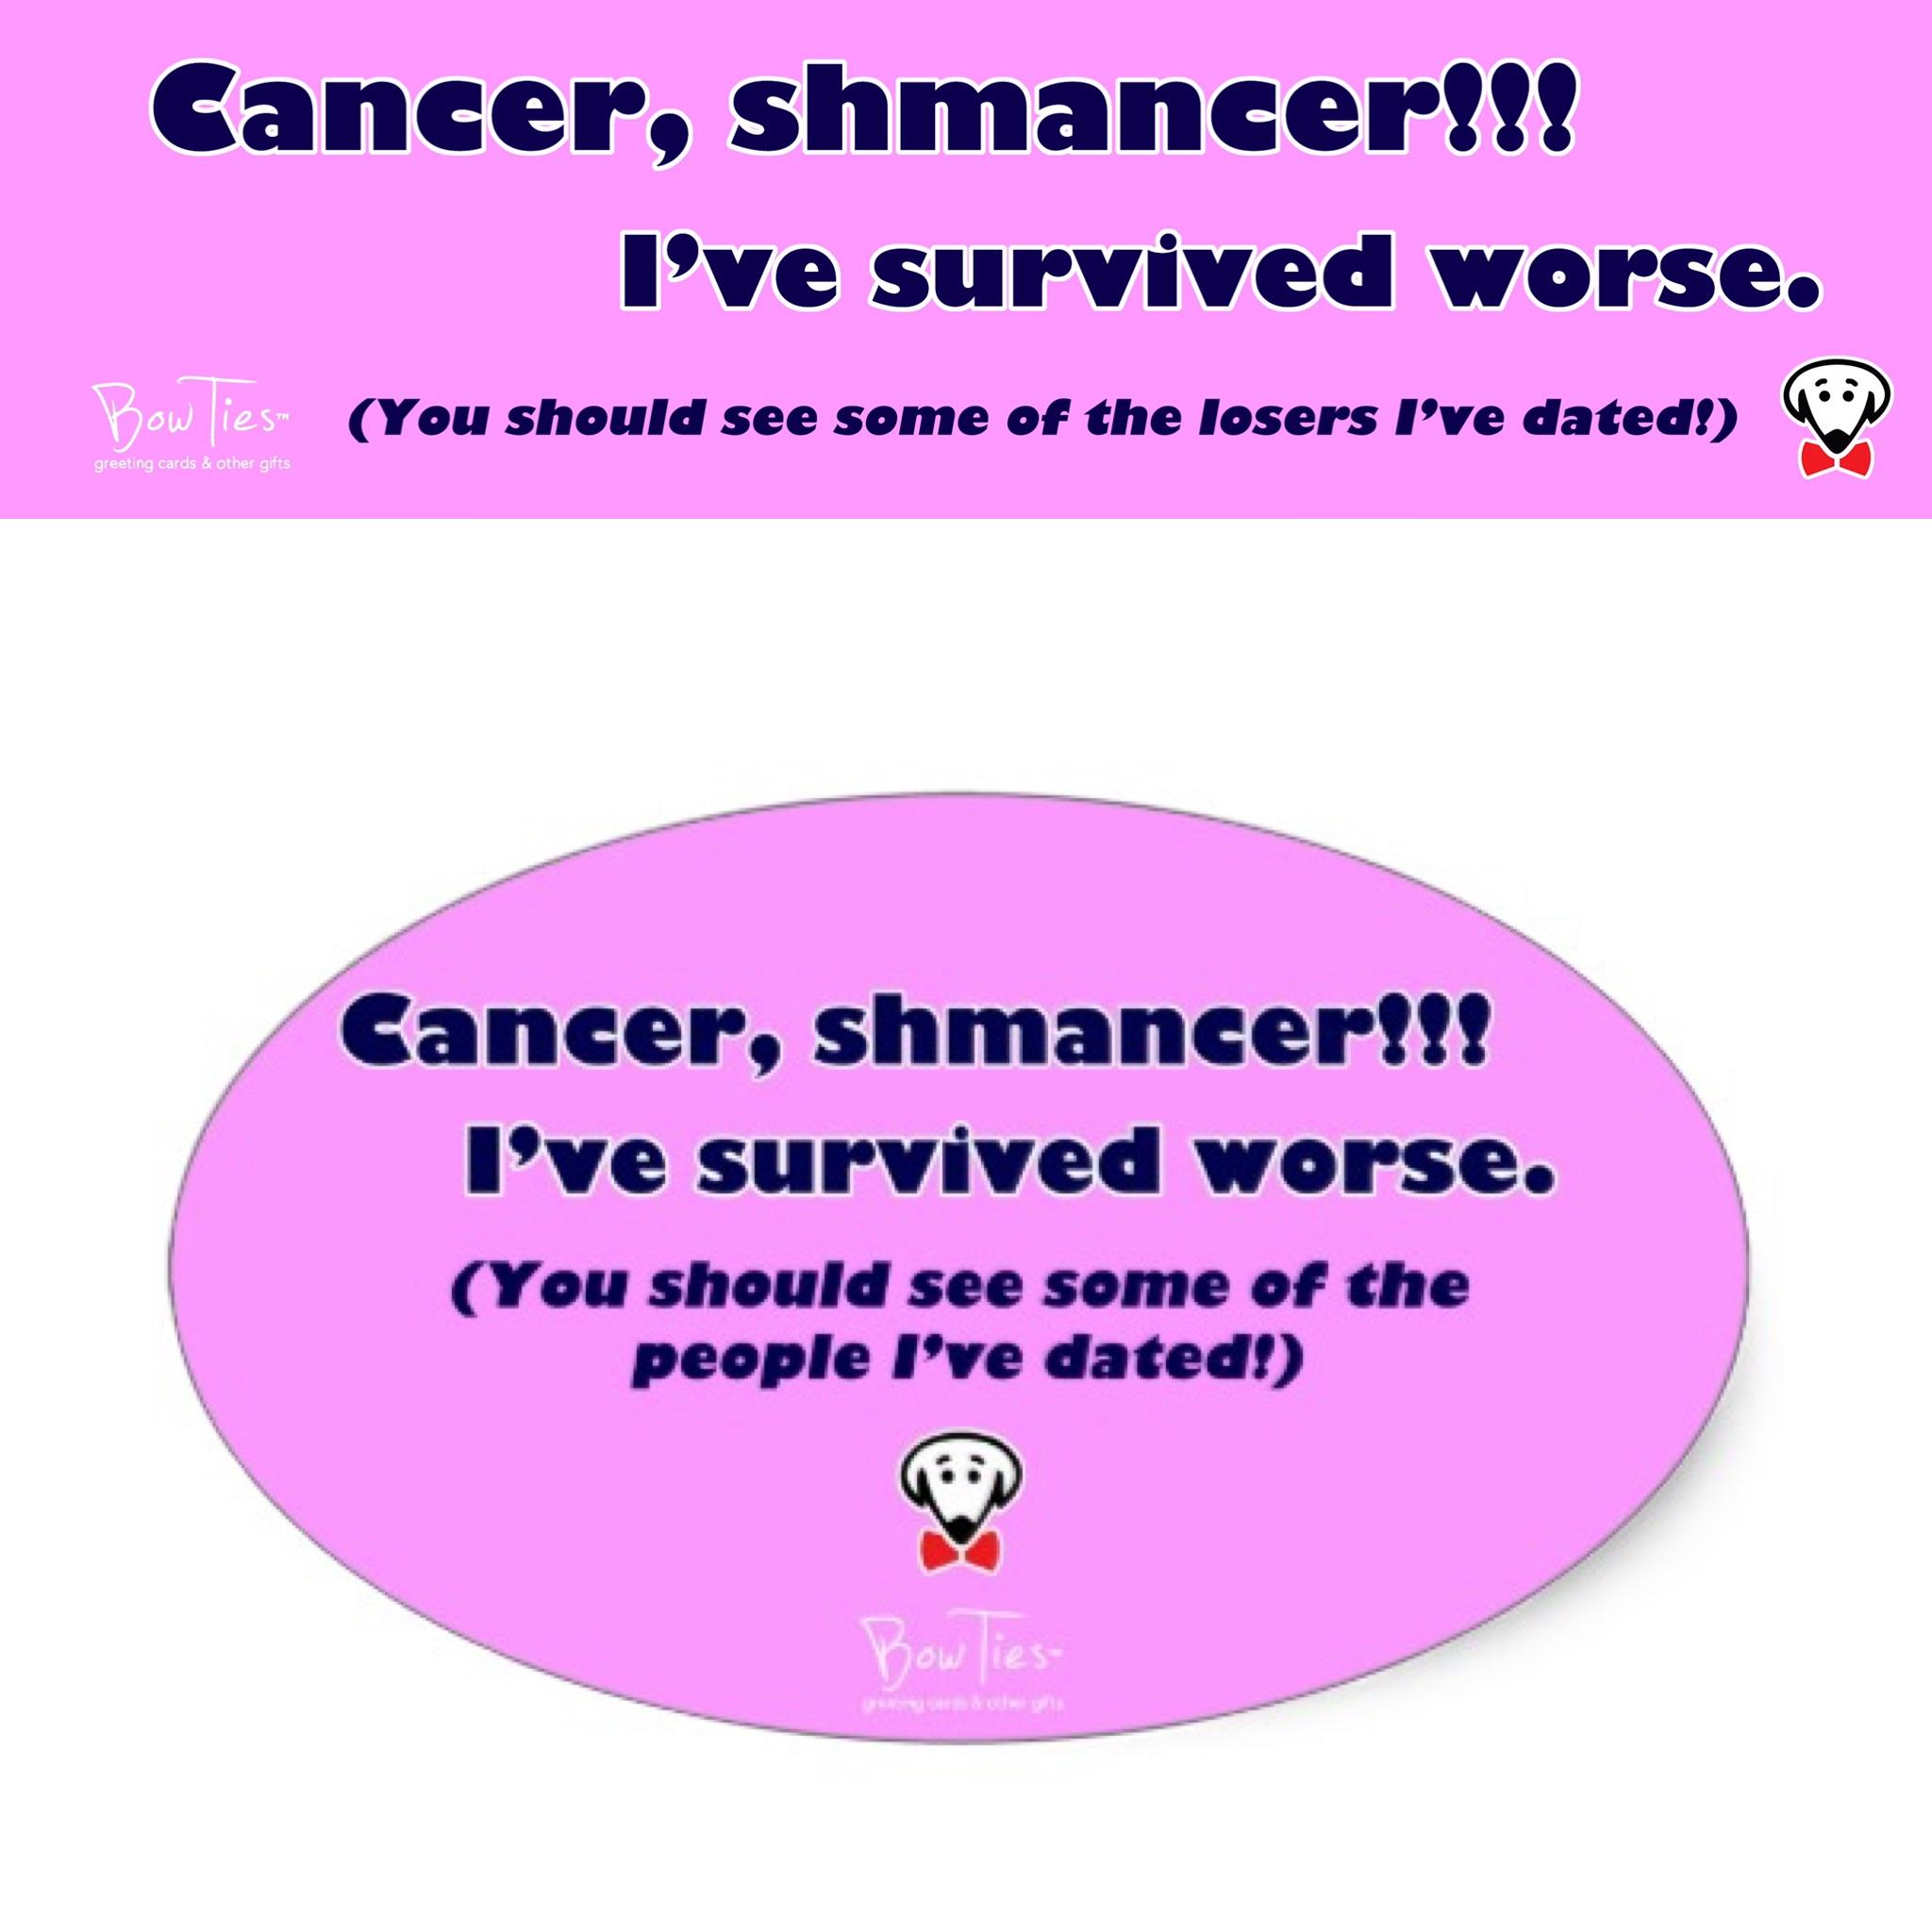 shmancer both